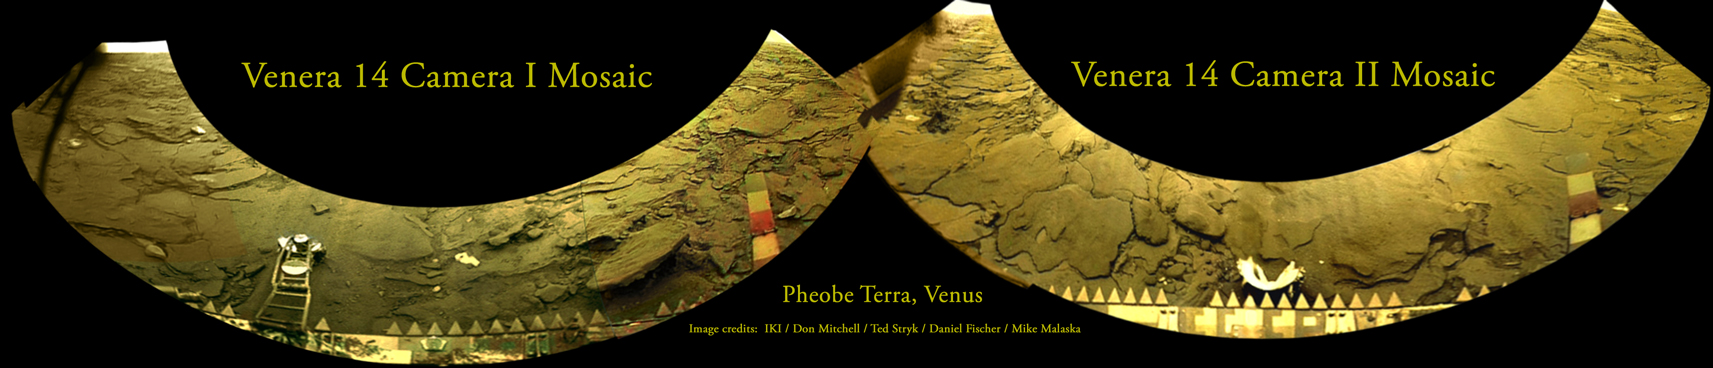 Roscosmos Planetary Exploration Missions - Page 6 Venera11